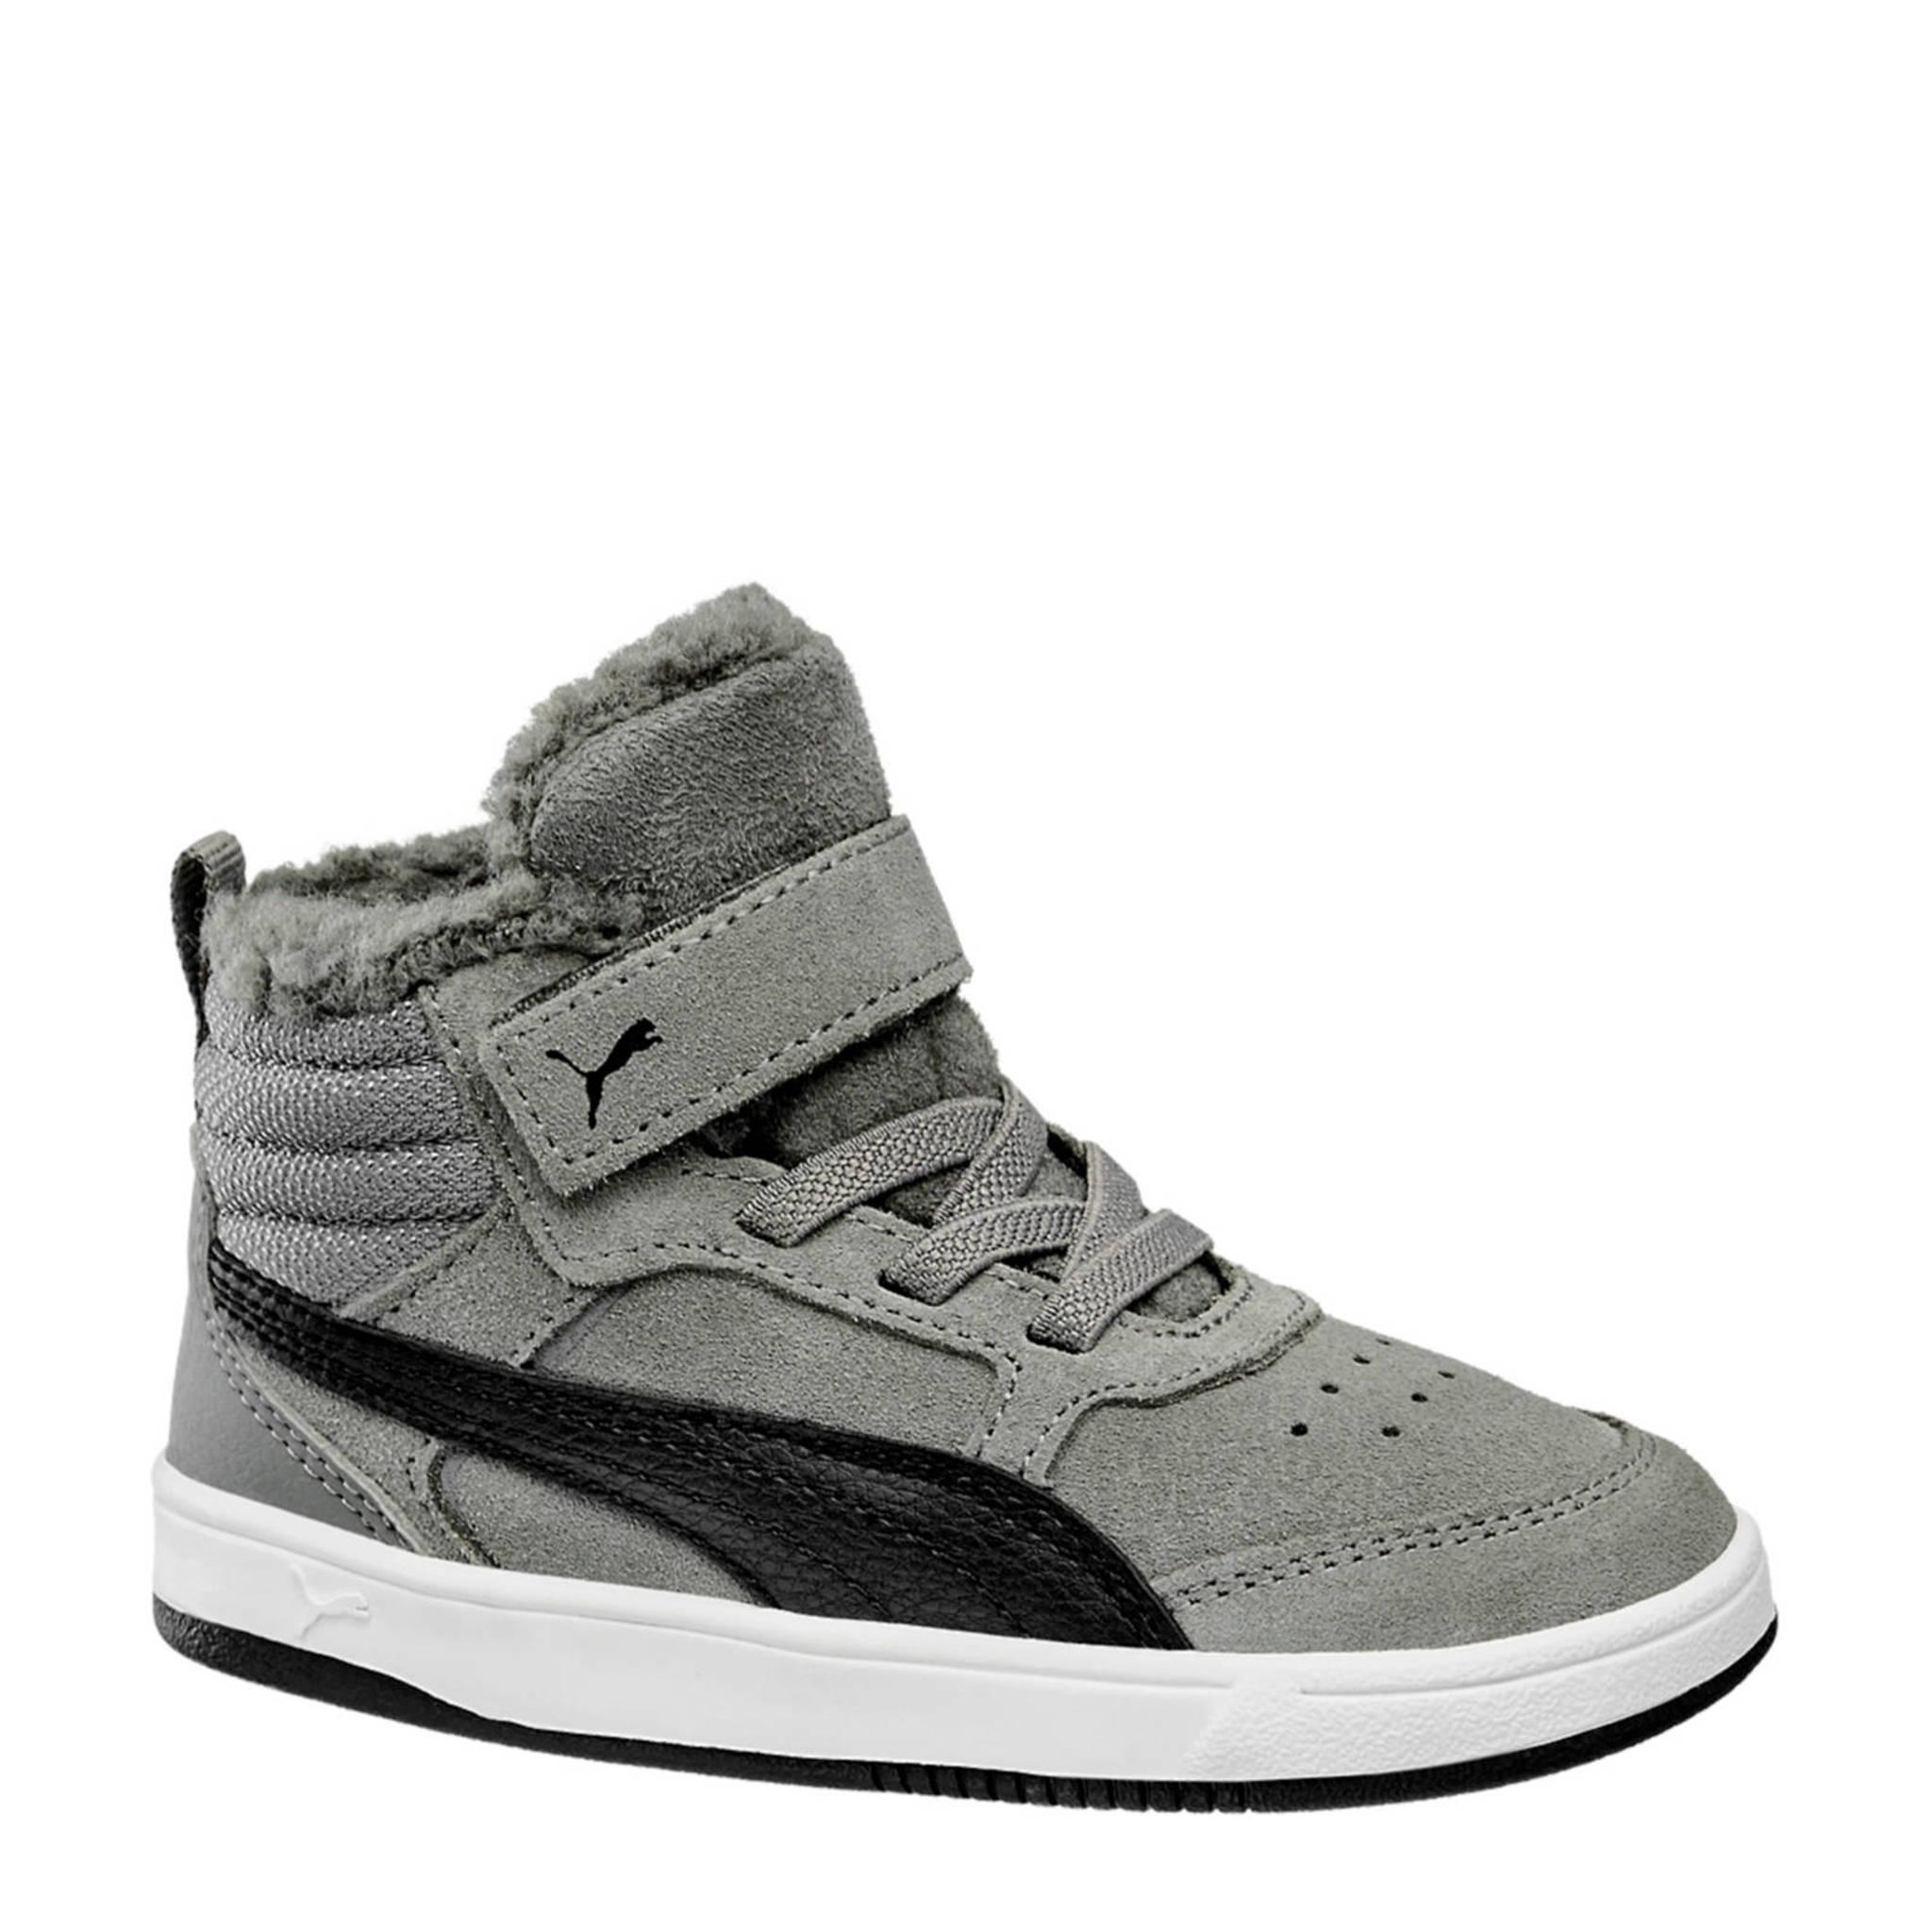 95af92c503d Puma Rebound Street V2 suède sneakers grijs | wehkamp